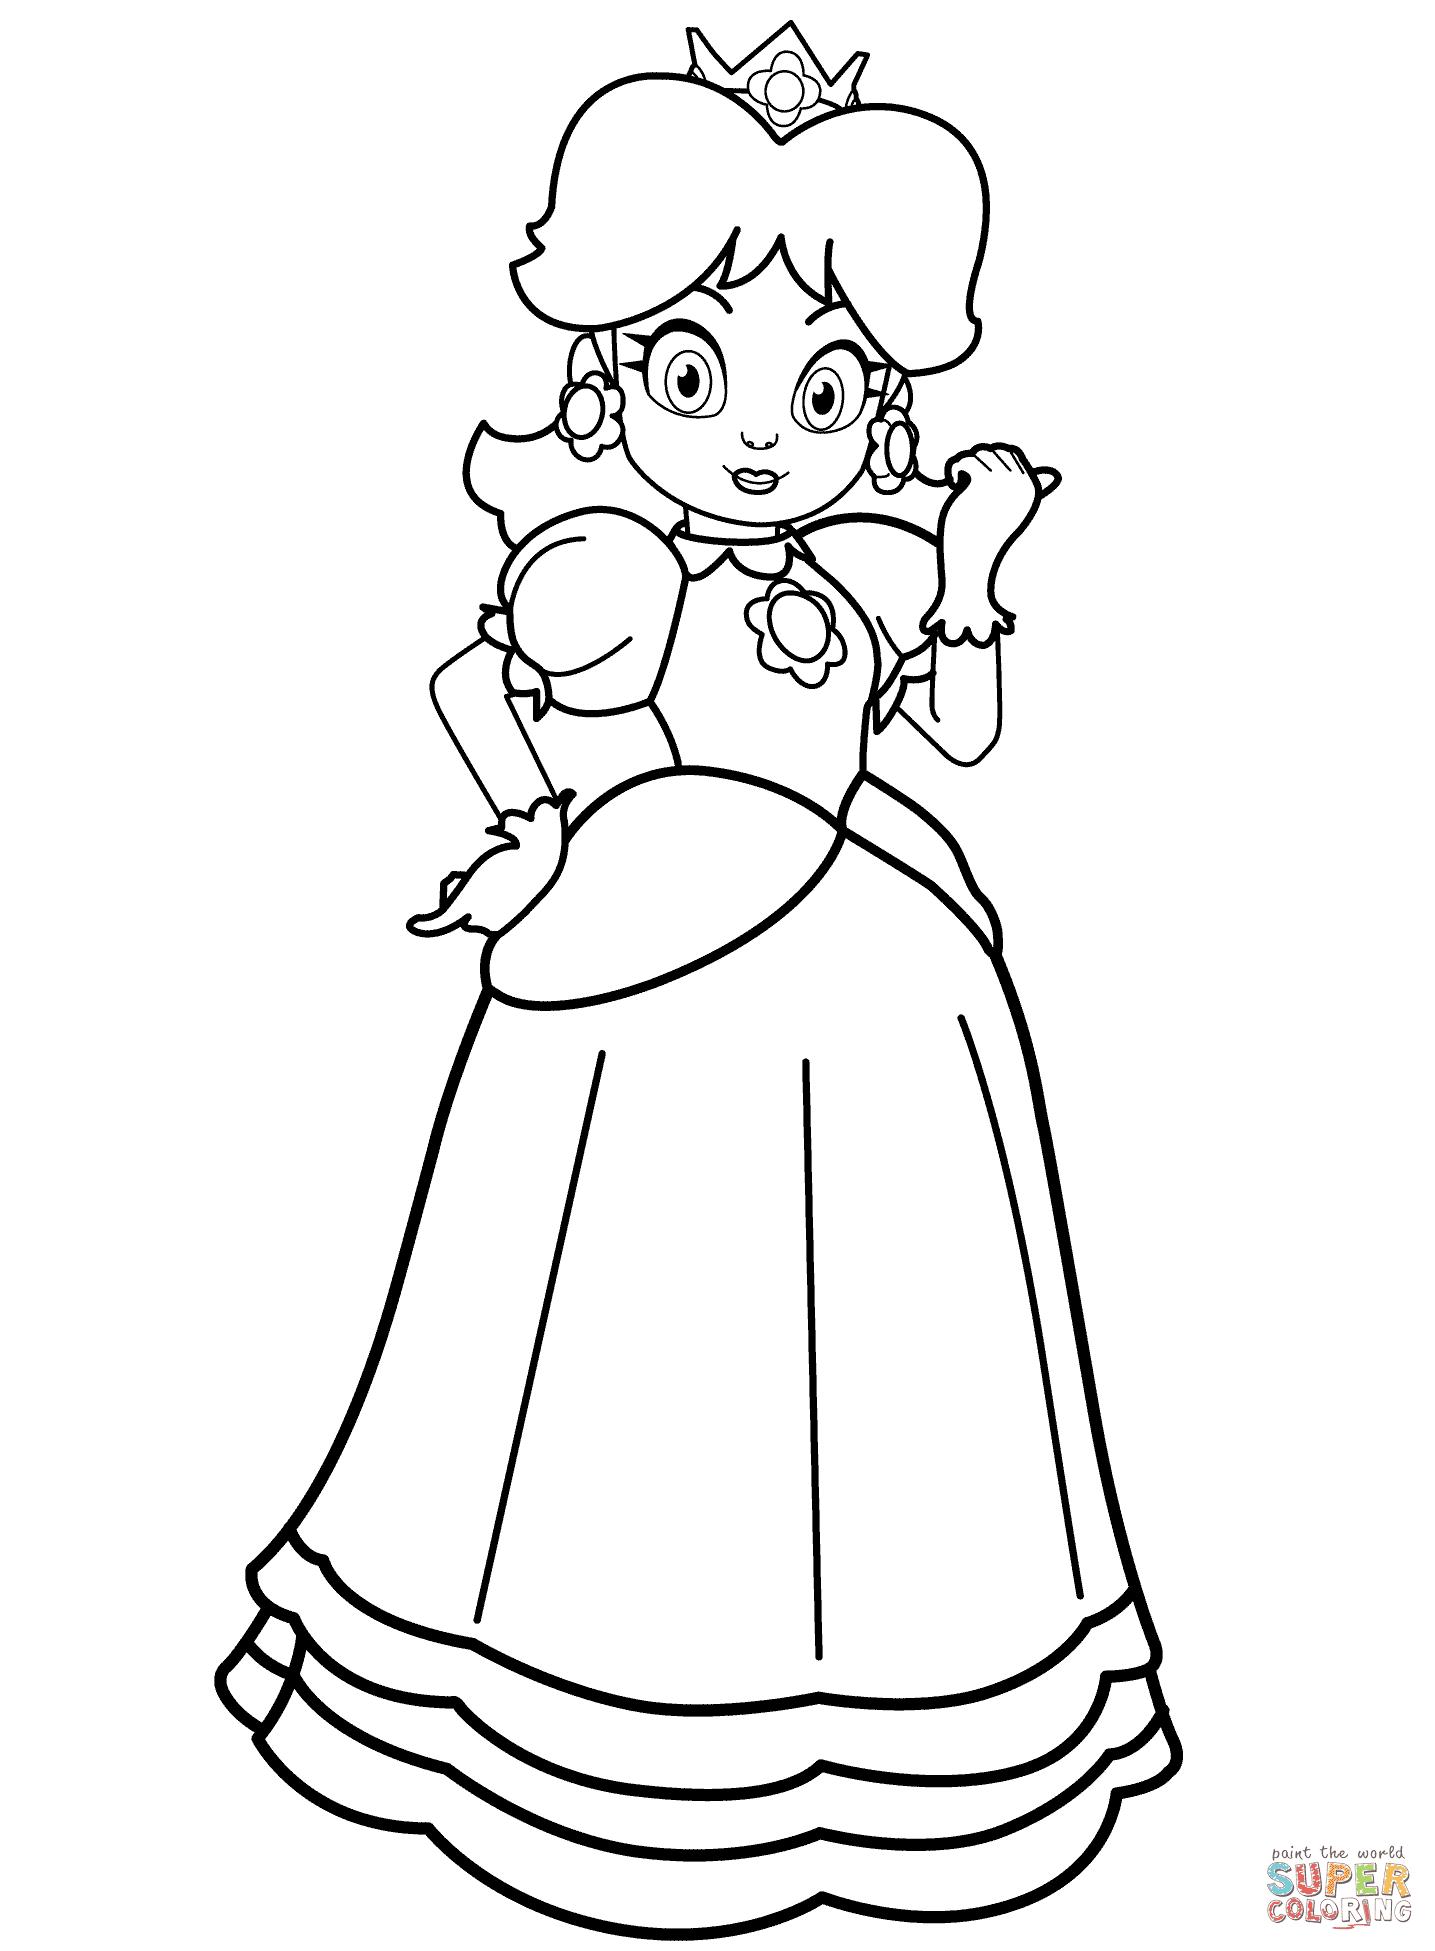 the Princess Daisy